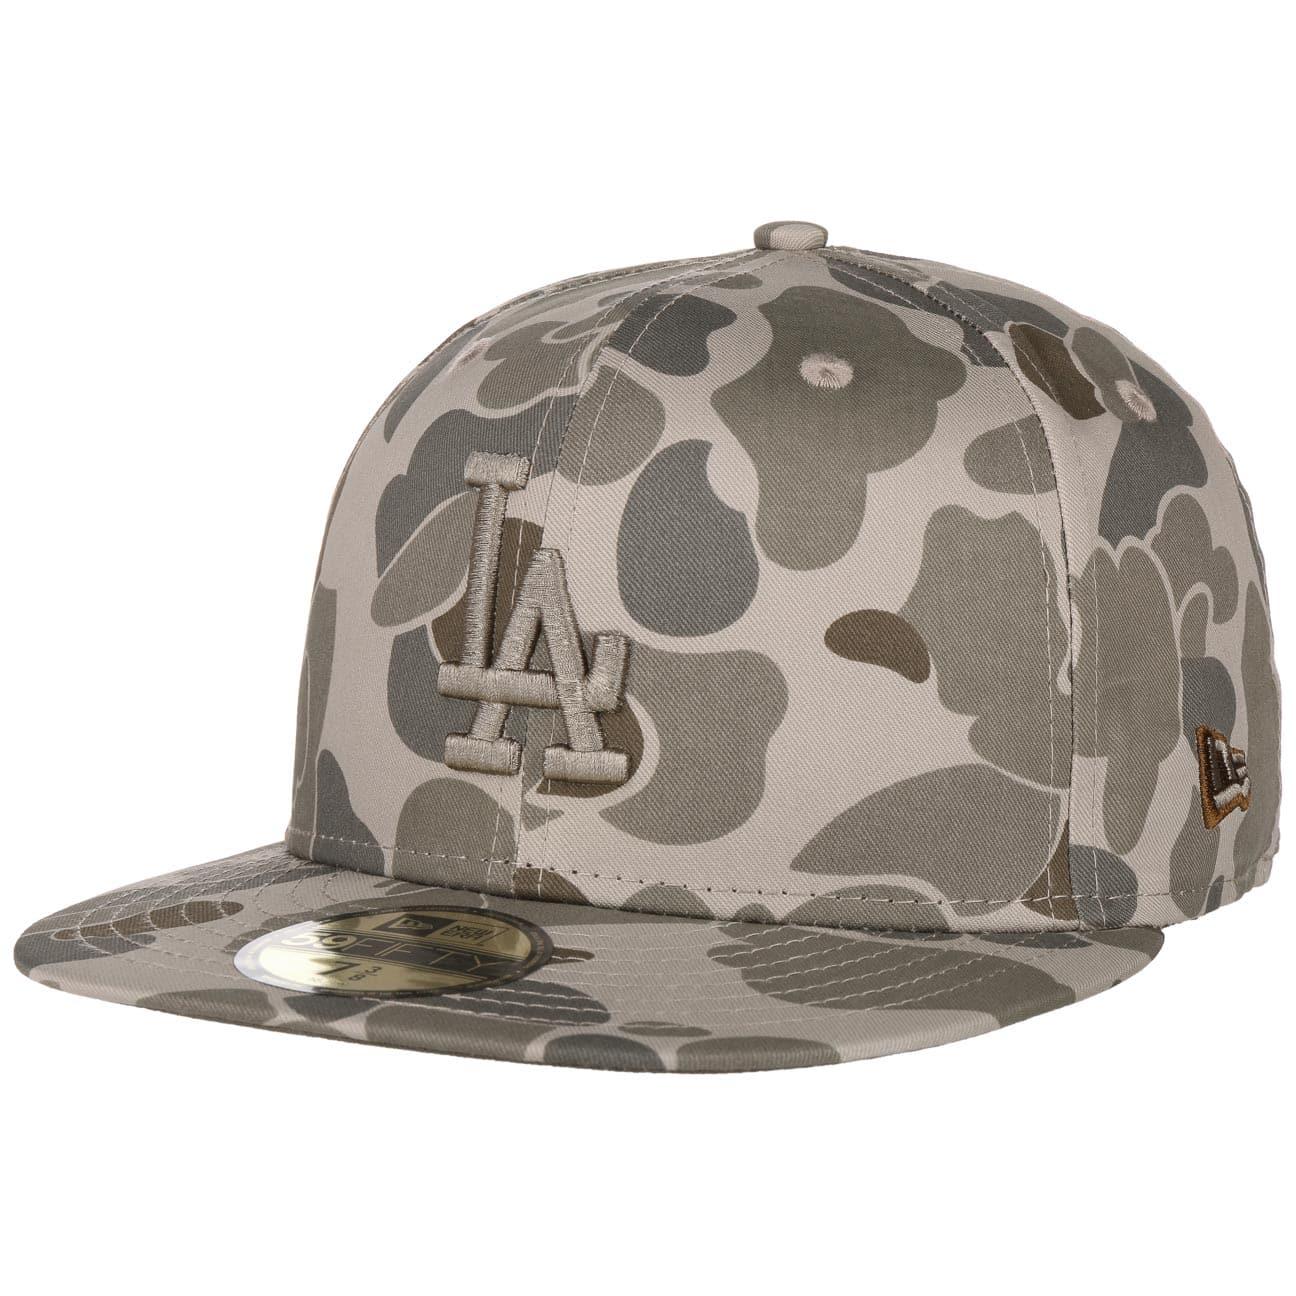 Casquette 59Fifty Camo Dodgers by New Era  baseball cap